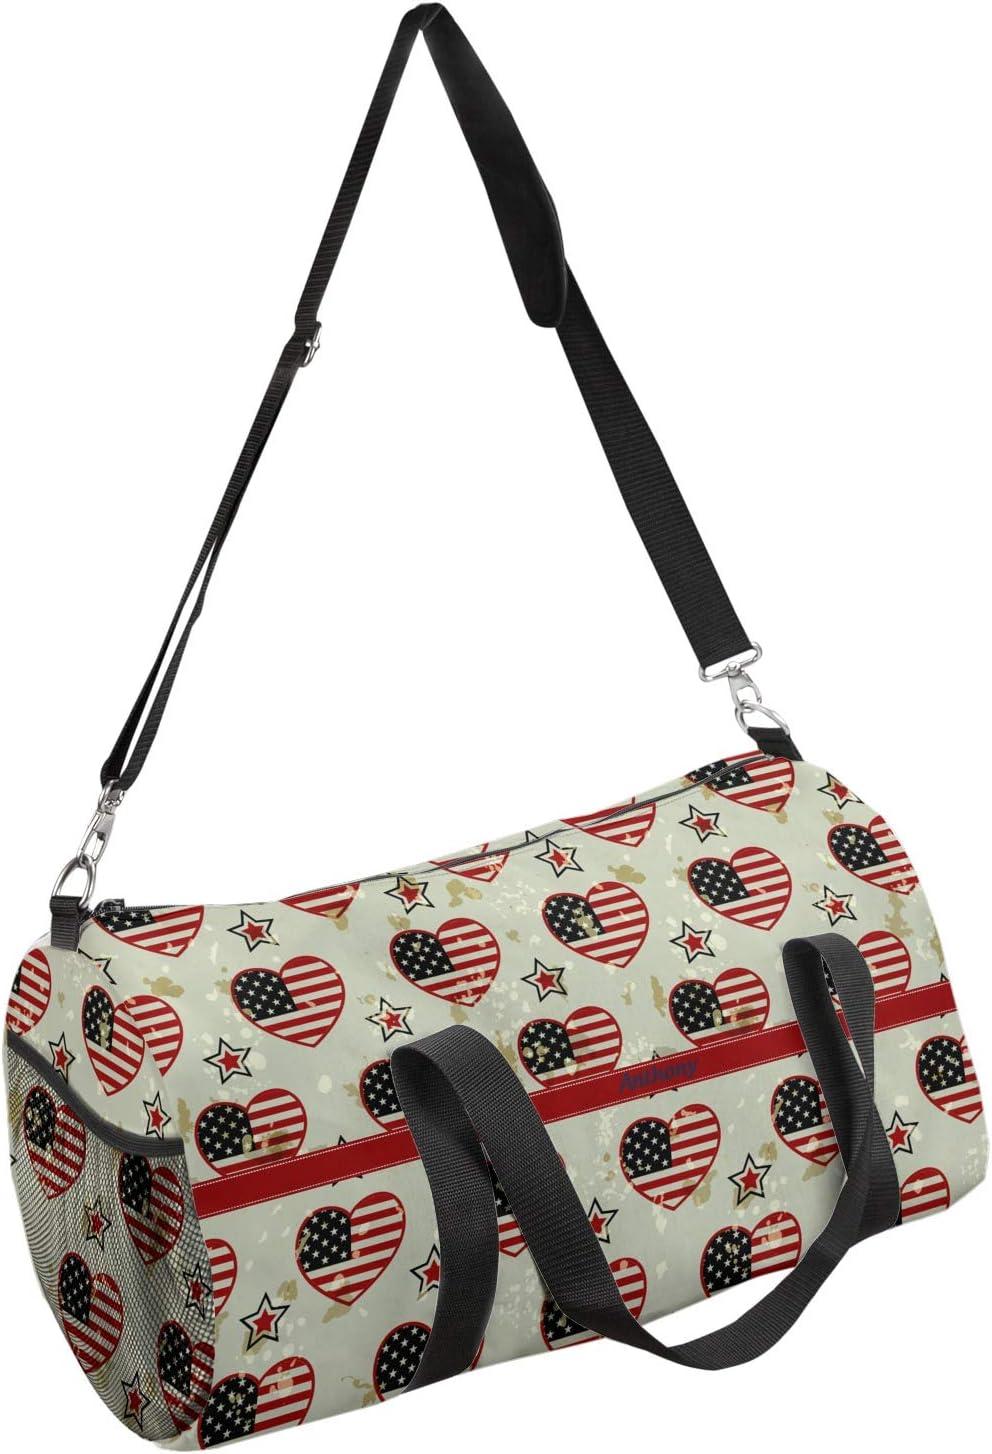 Personalized YouCustomizeIt Americana Duffel Bag